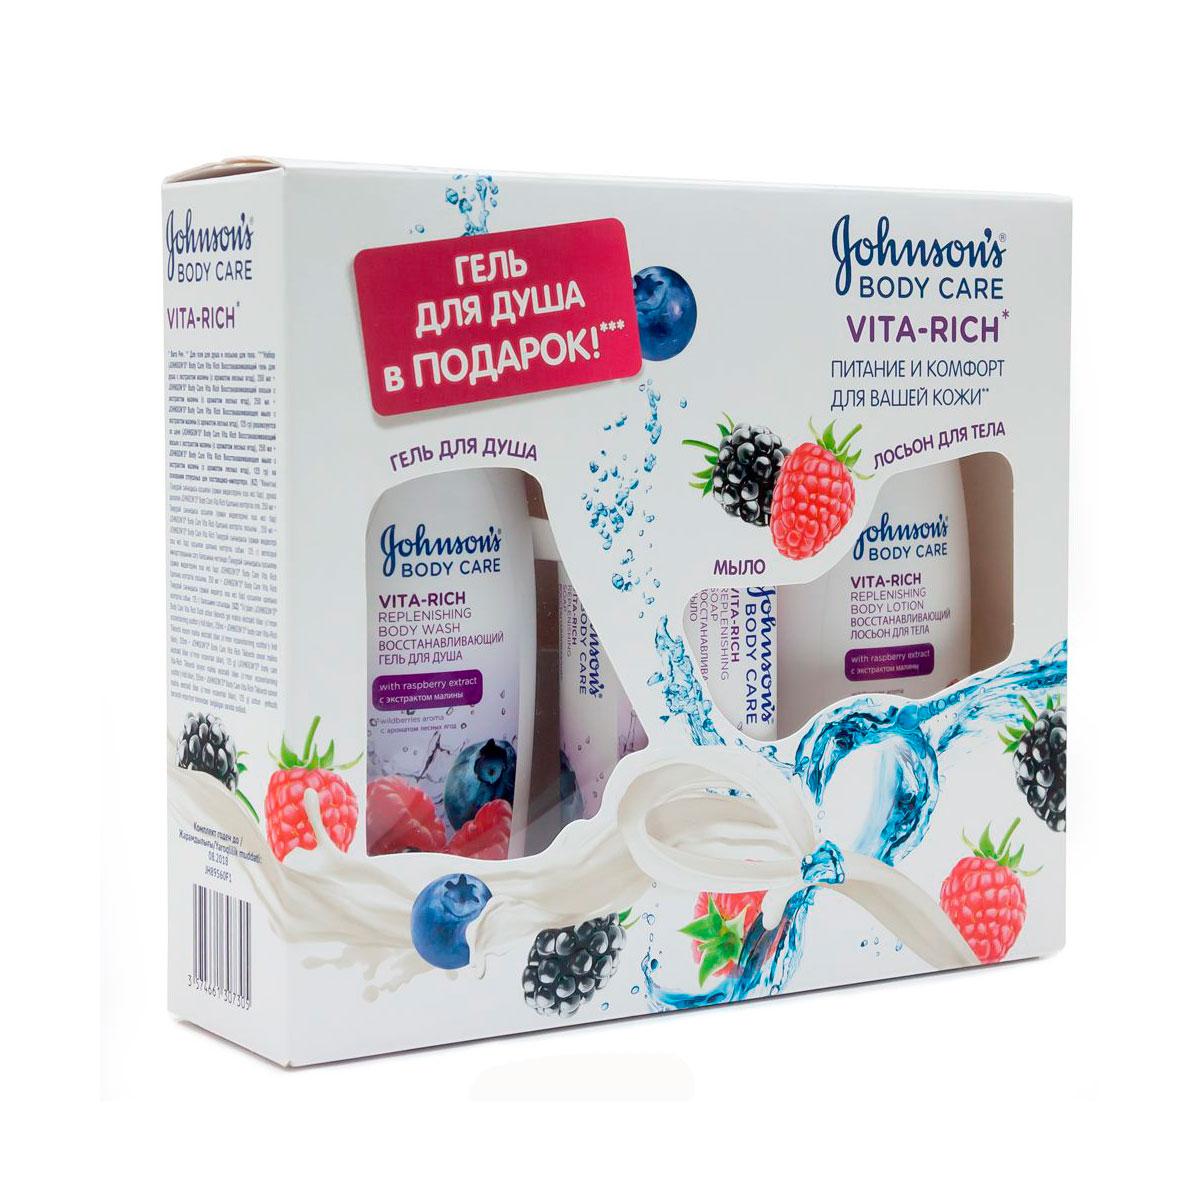 Набор Johnson&amp;#039;s body care Vita-Rich Экстракт лесных ягод Лосьон для тела 250 мл + мыло 125 г + гель для душа  250 мл<br>